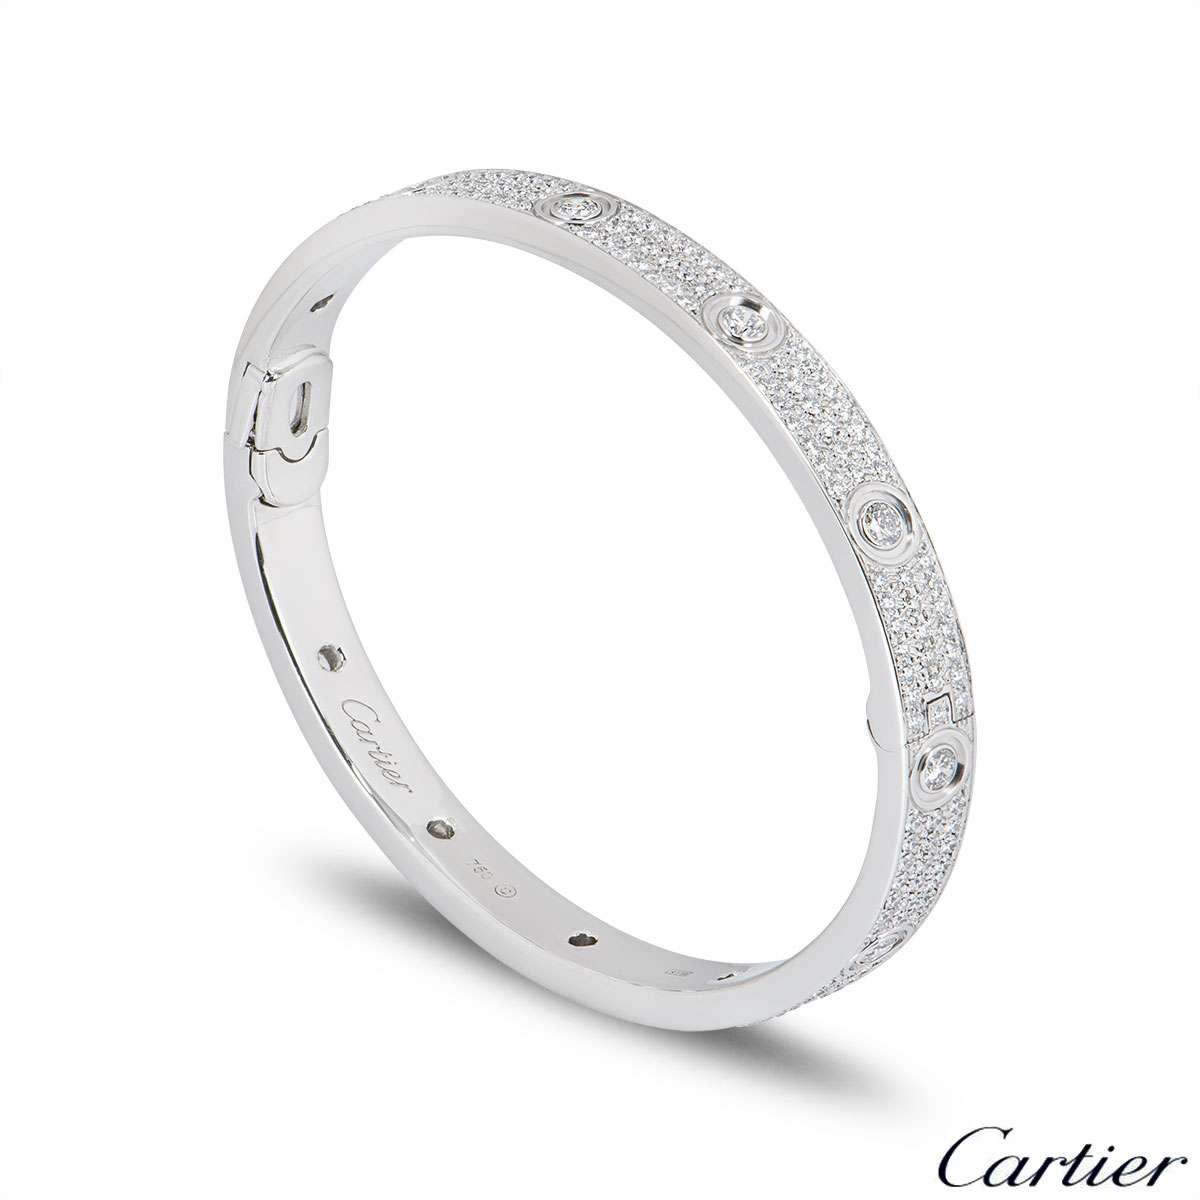 Cartier White Gold Pave Diamond Love Bracelet Size 18 N6033602